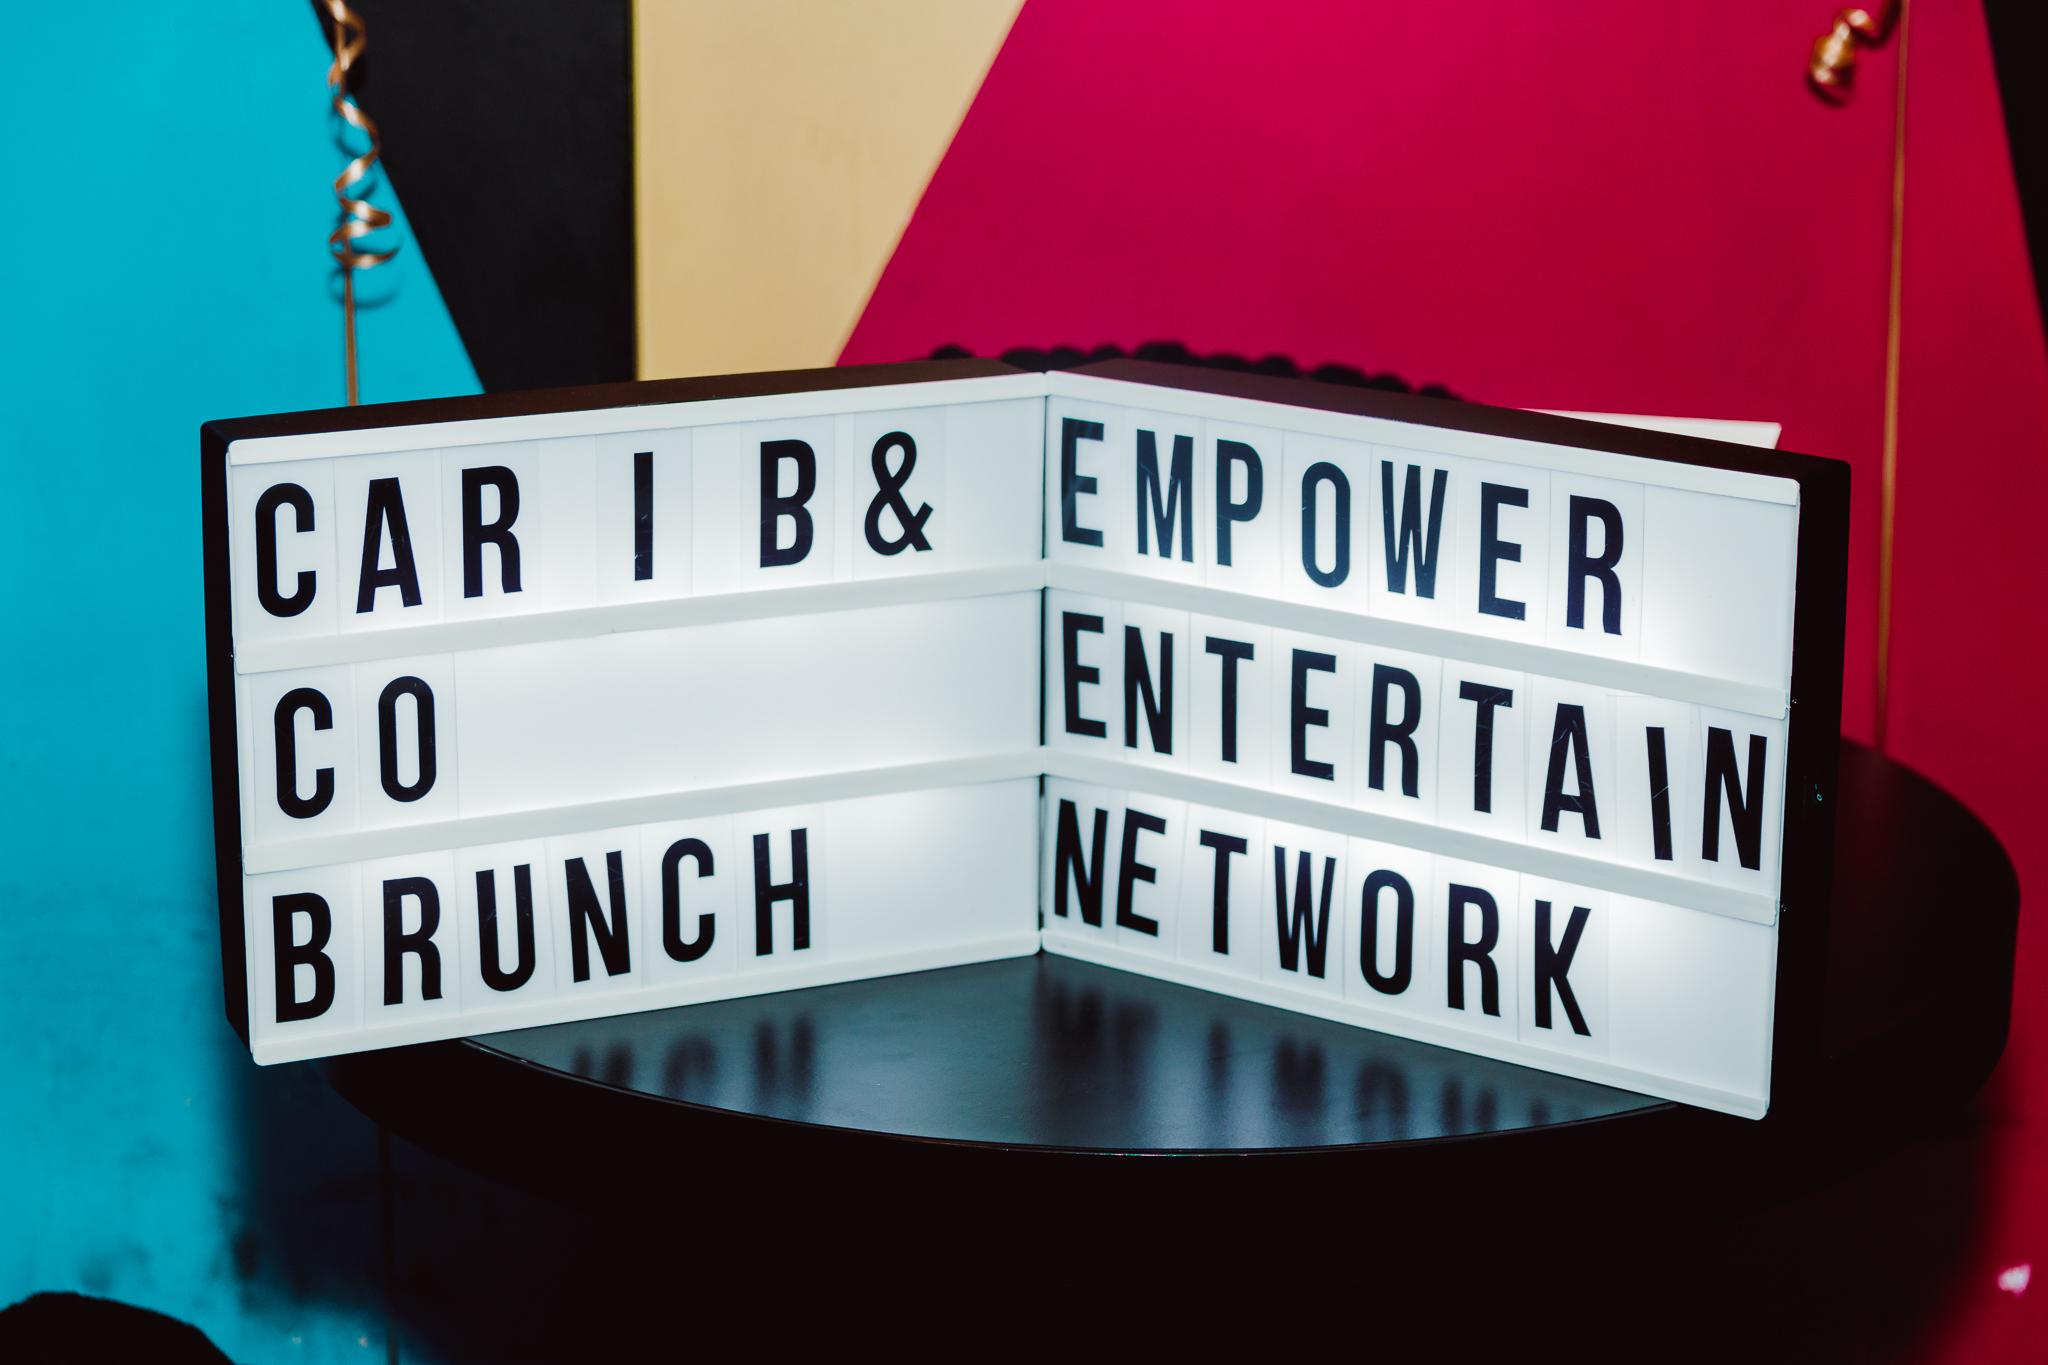 Carib & Co Brunch